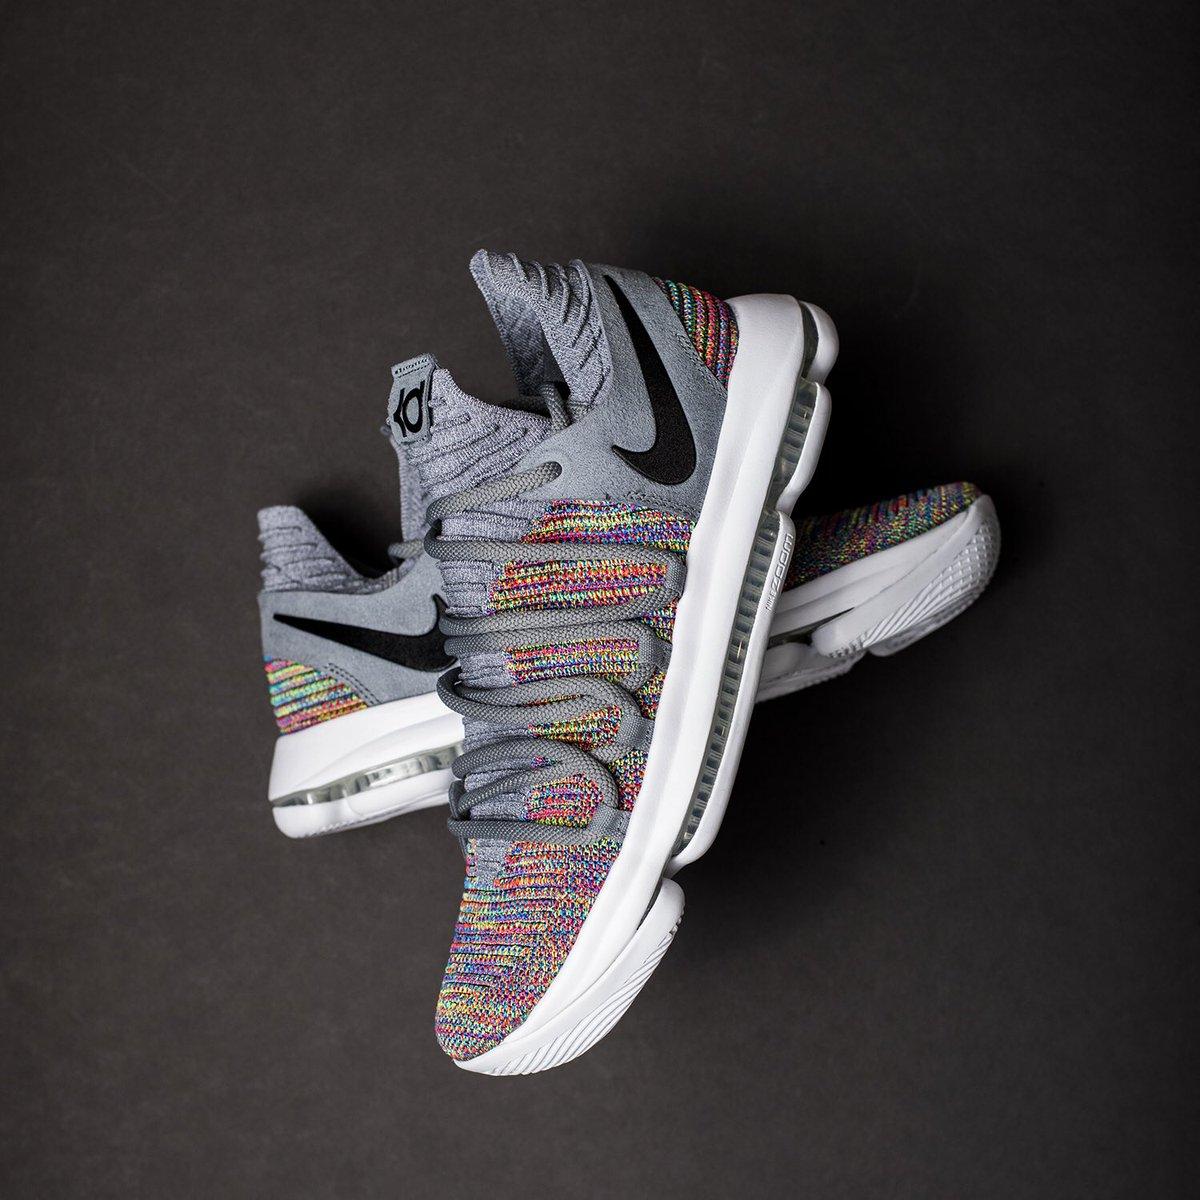 e8330a0e1fc3 Now Available  Nike Zoom KD X